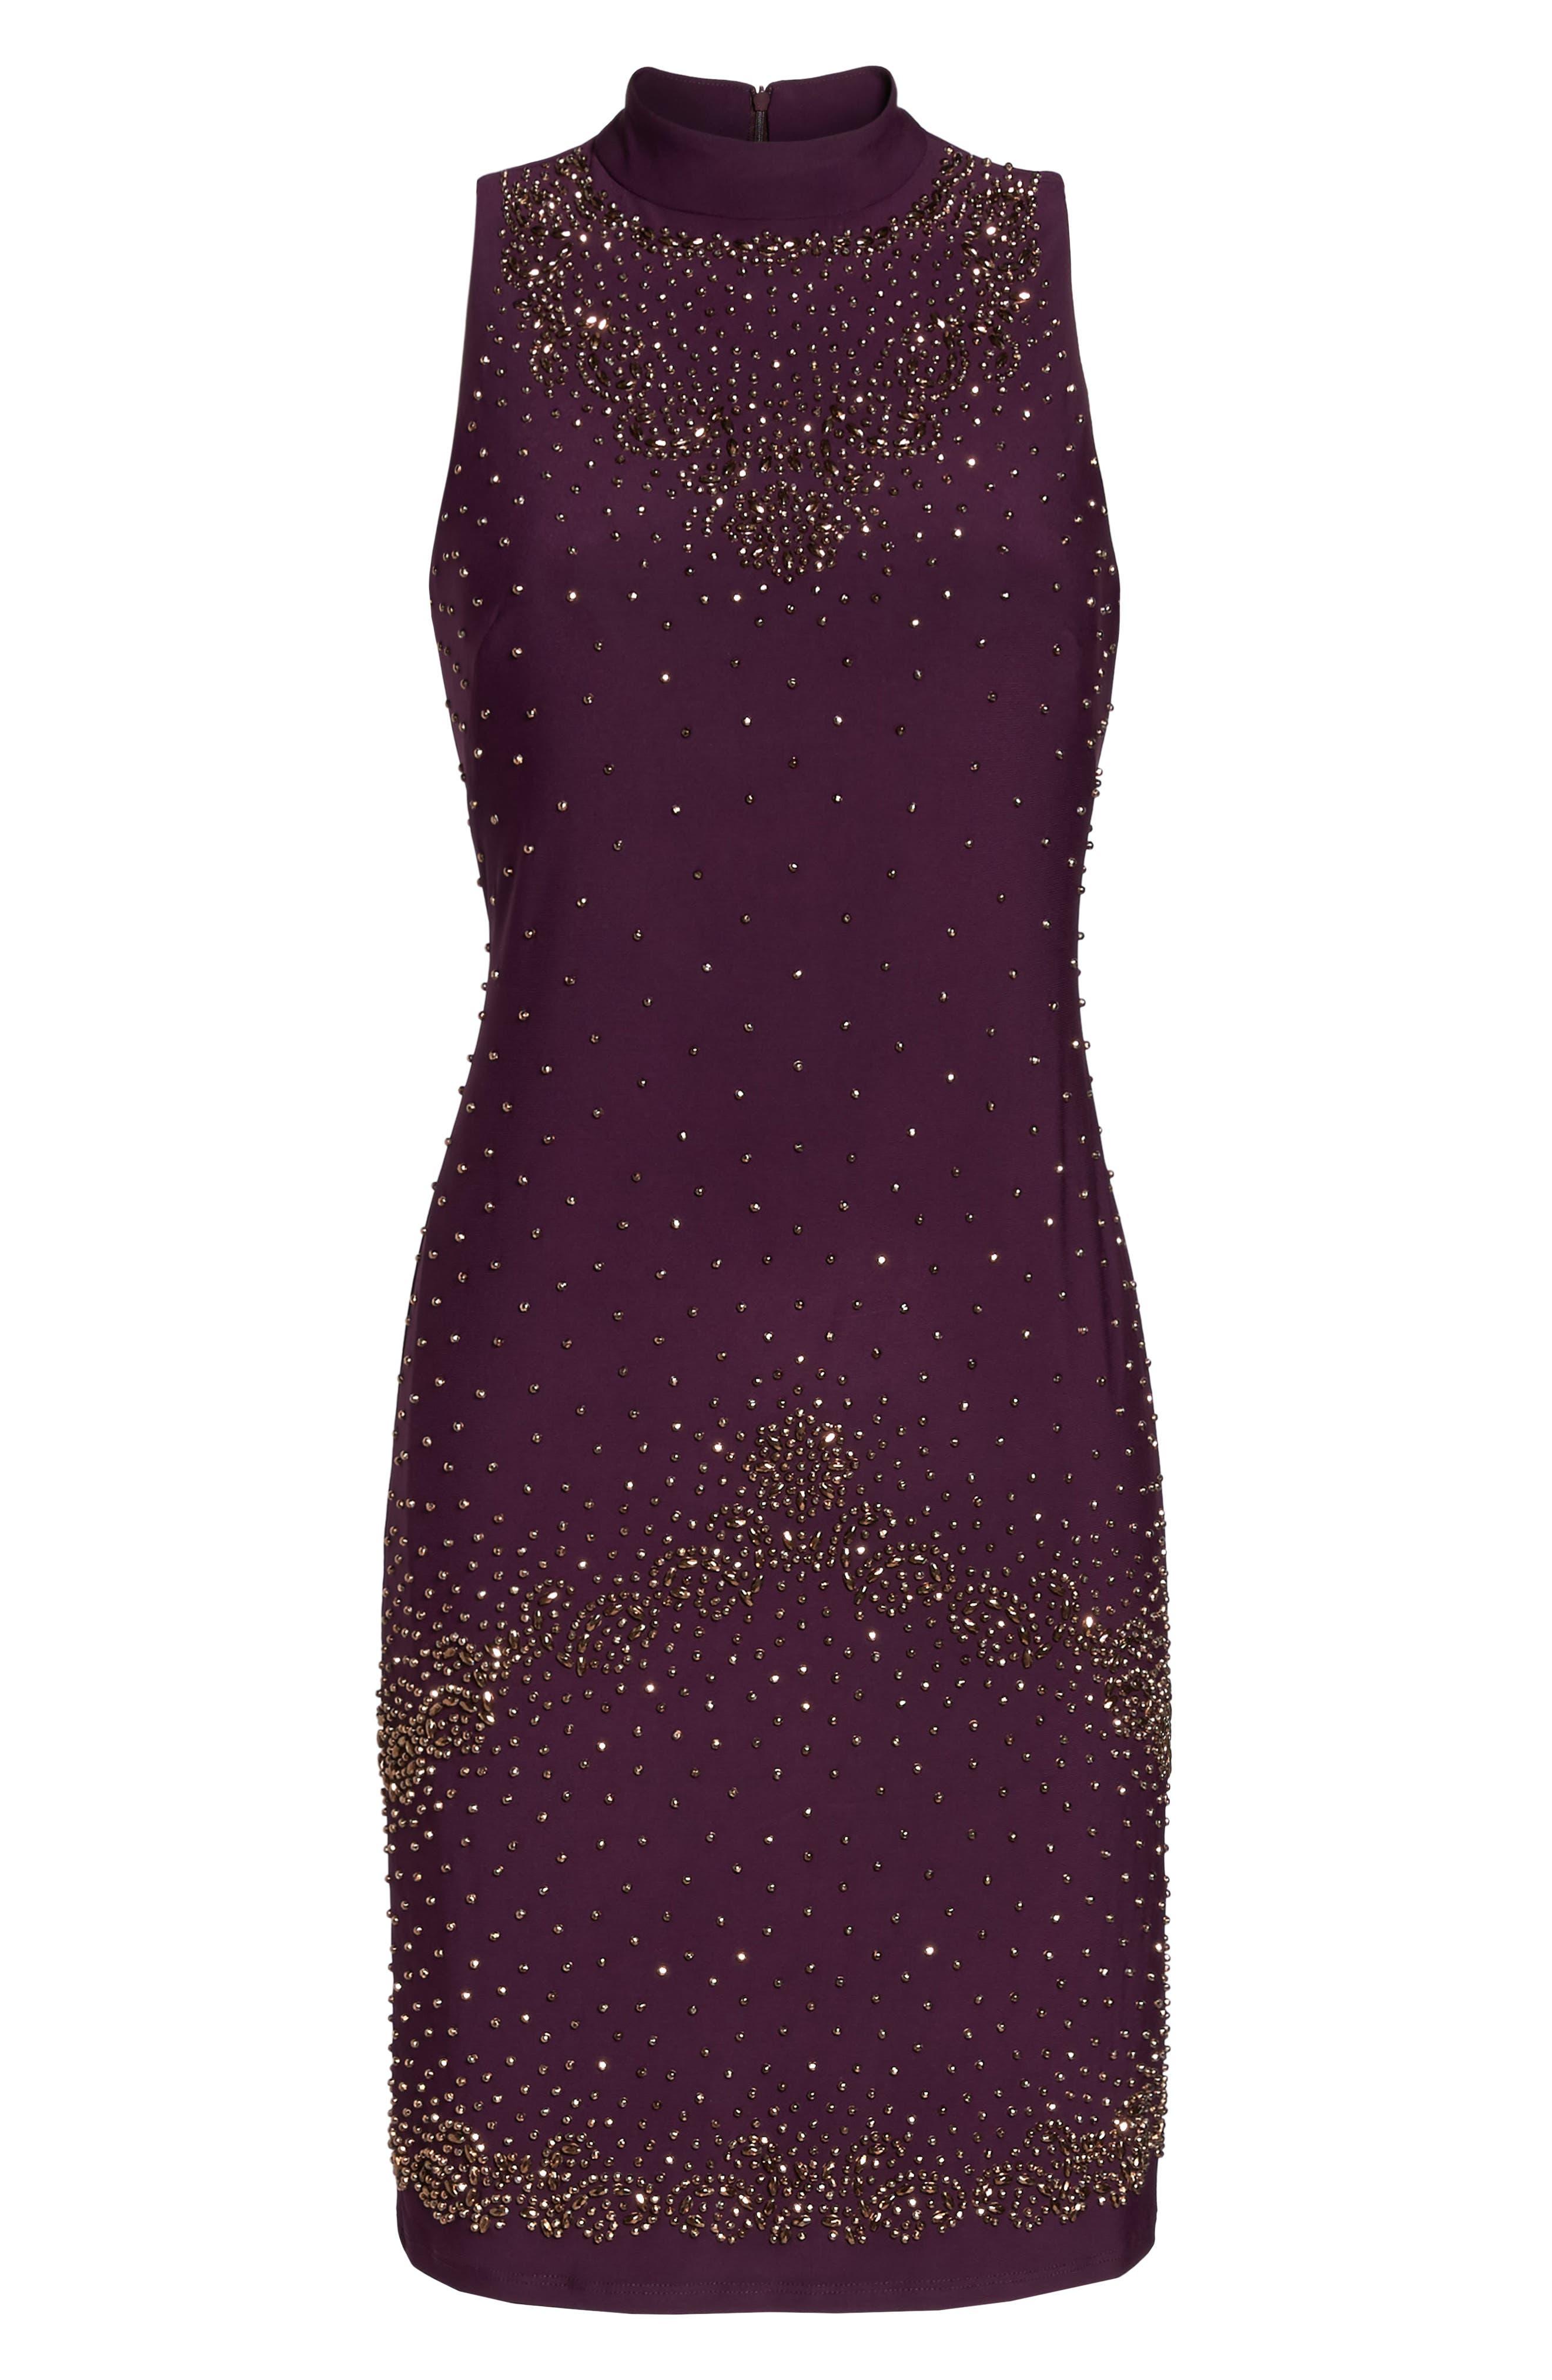 Beaded Sheath Dress,                             Alternate thumbnail 6, color,                             Eggplant